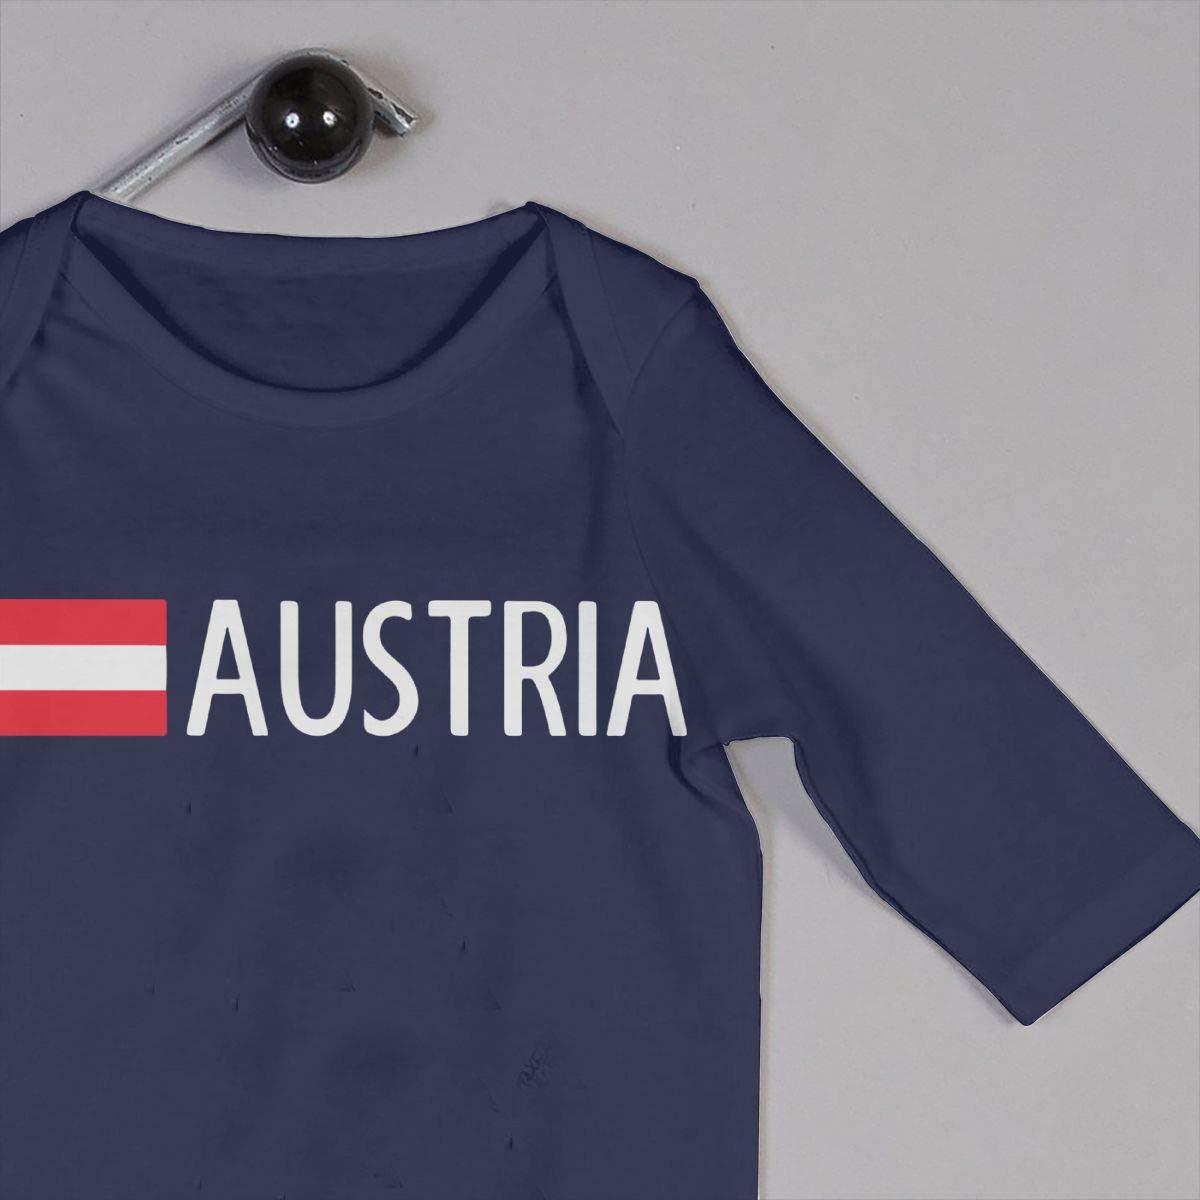 LBJQ8 Austria Baby Boy Girl Sleep and Play Bodysuit Outfits Clothes